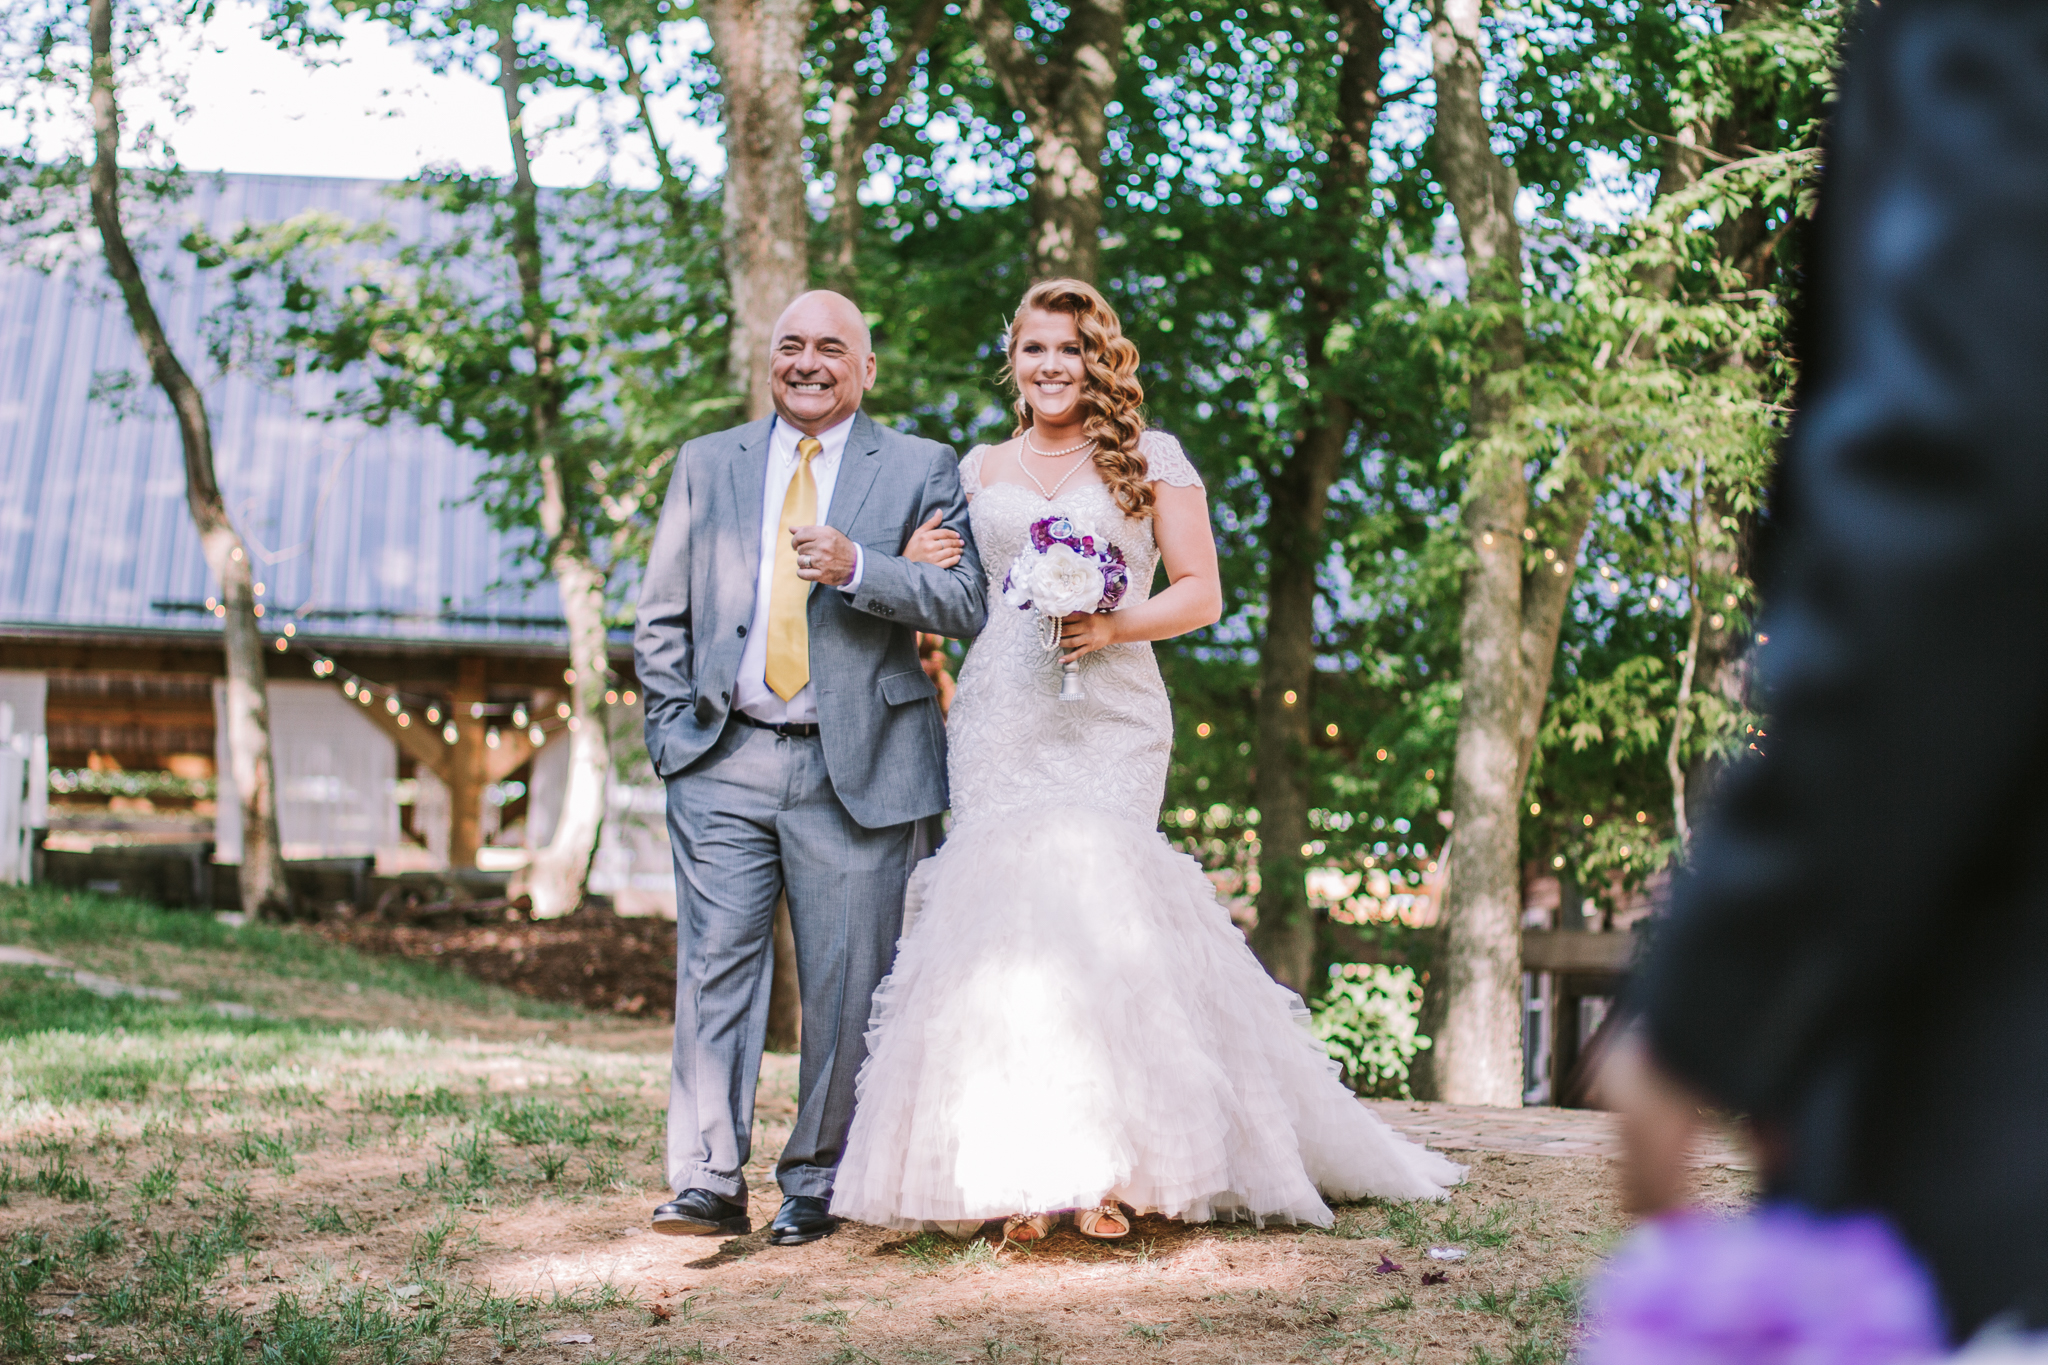 Richmond Kentucky Wedding Photographer - Ariana Jordan Photography -6.jpg